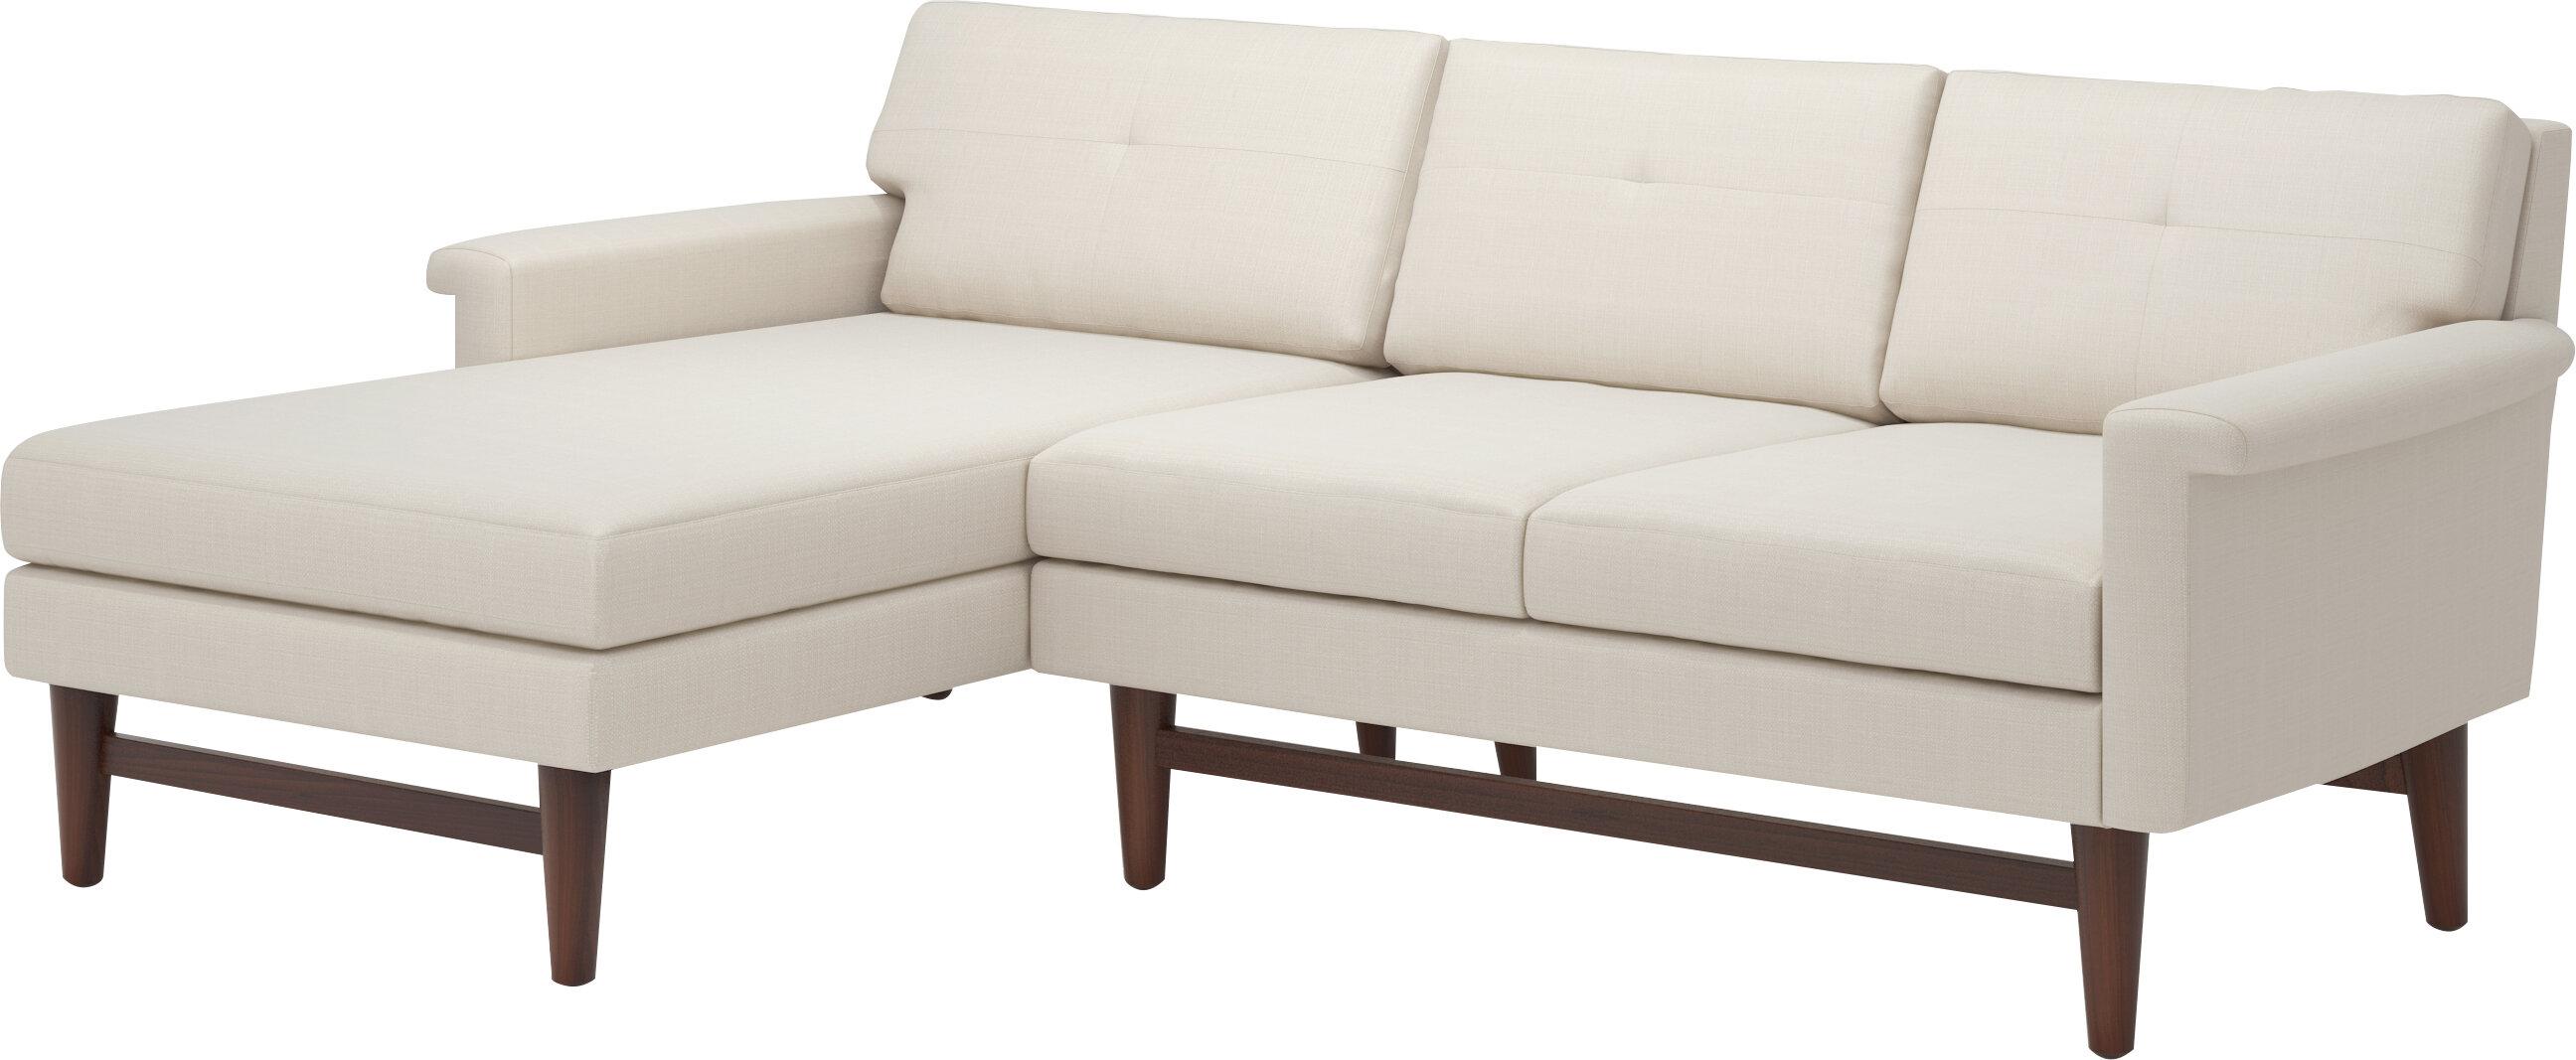 Prime Truemodern Diggity 90 Sofa With Chaise Wayfair Frankydiablos Diy Chair Ideas Frankydiabloscom